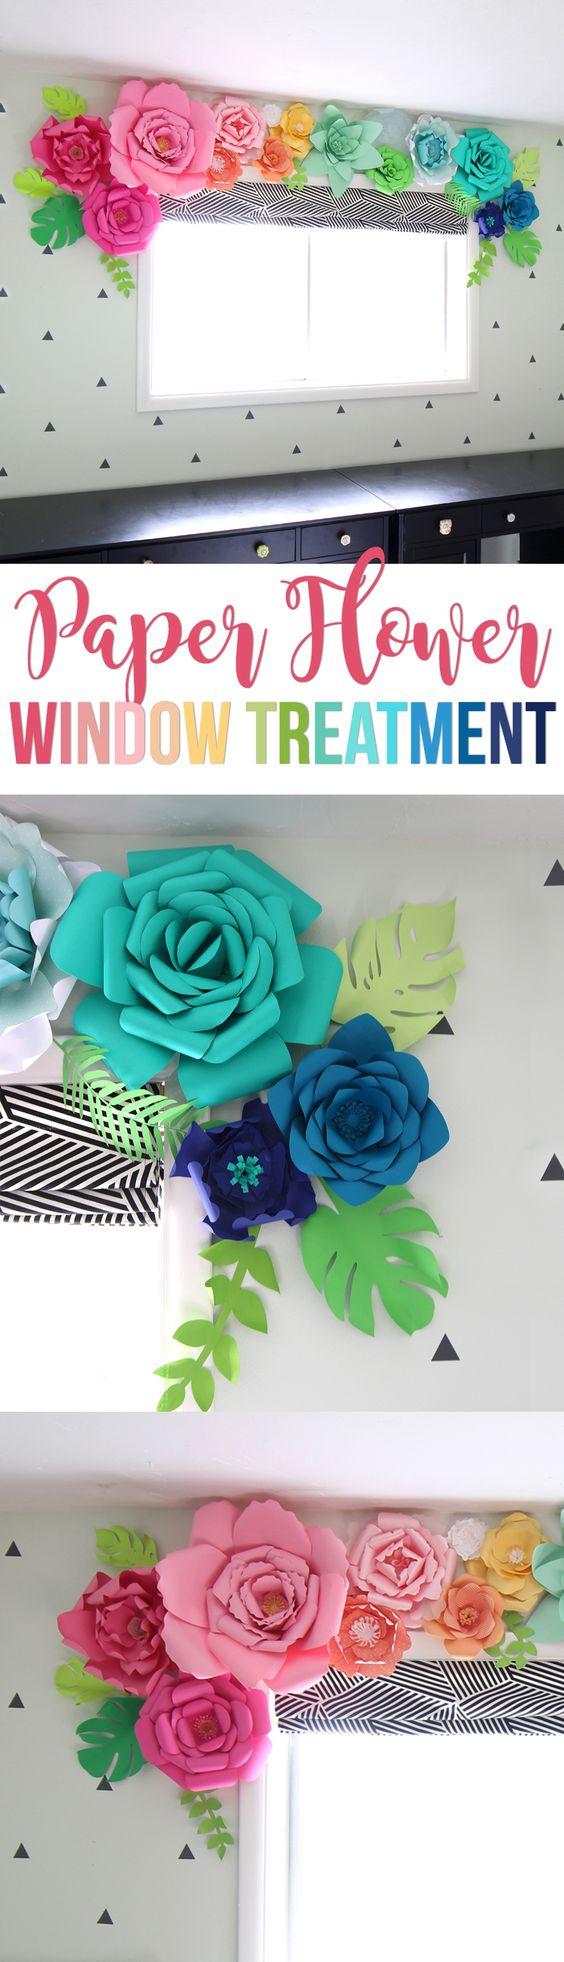 3D Paper Flower Window Treatment.